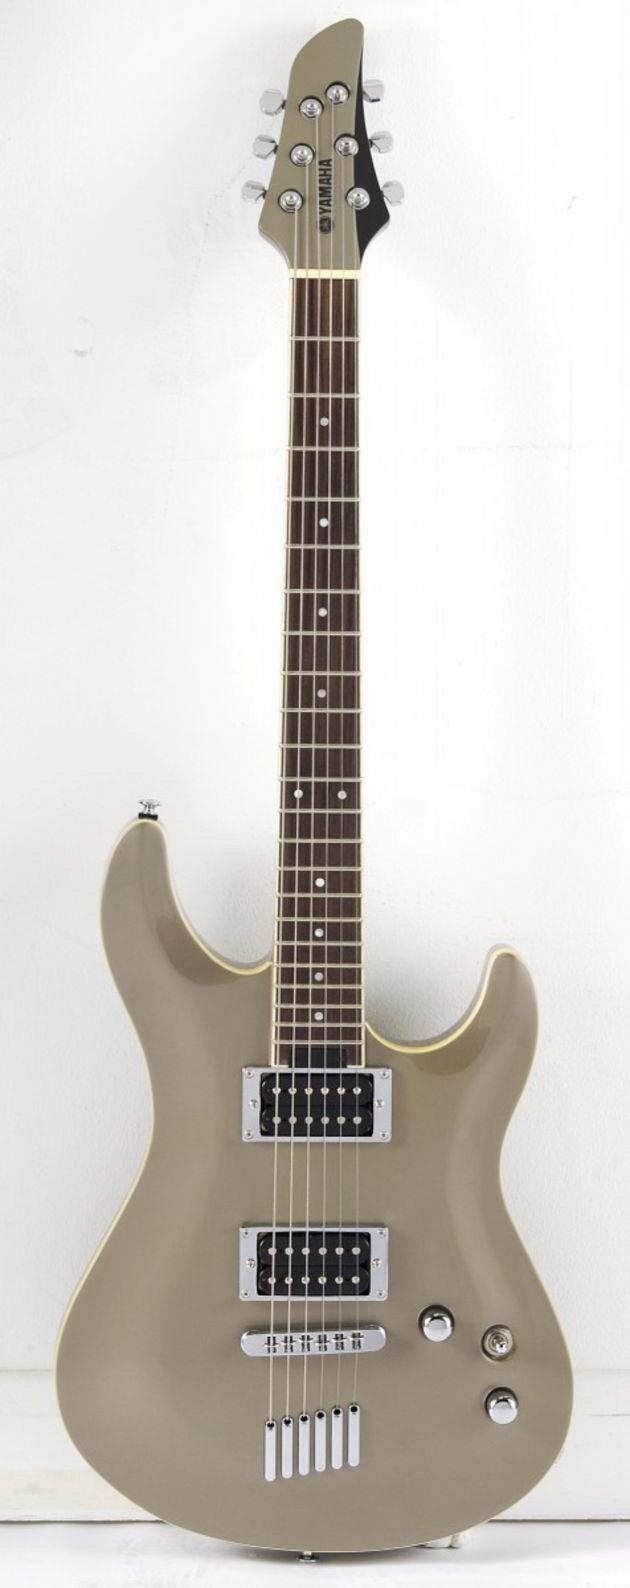 yamaha rgx320fz guitar reviews musicradar. Black Bedroom Furniture Sets. Home Design Ideas